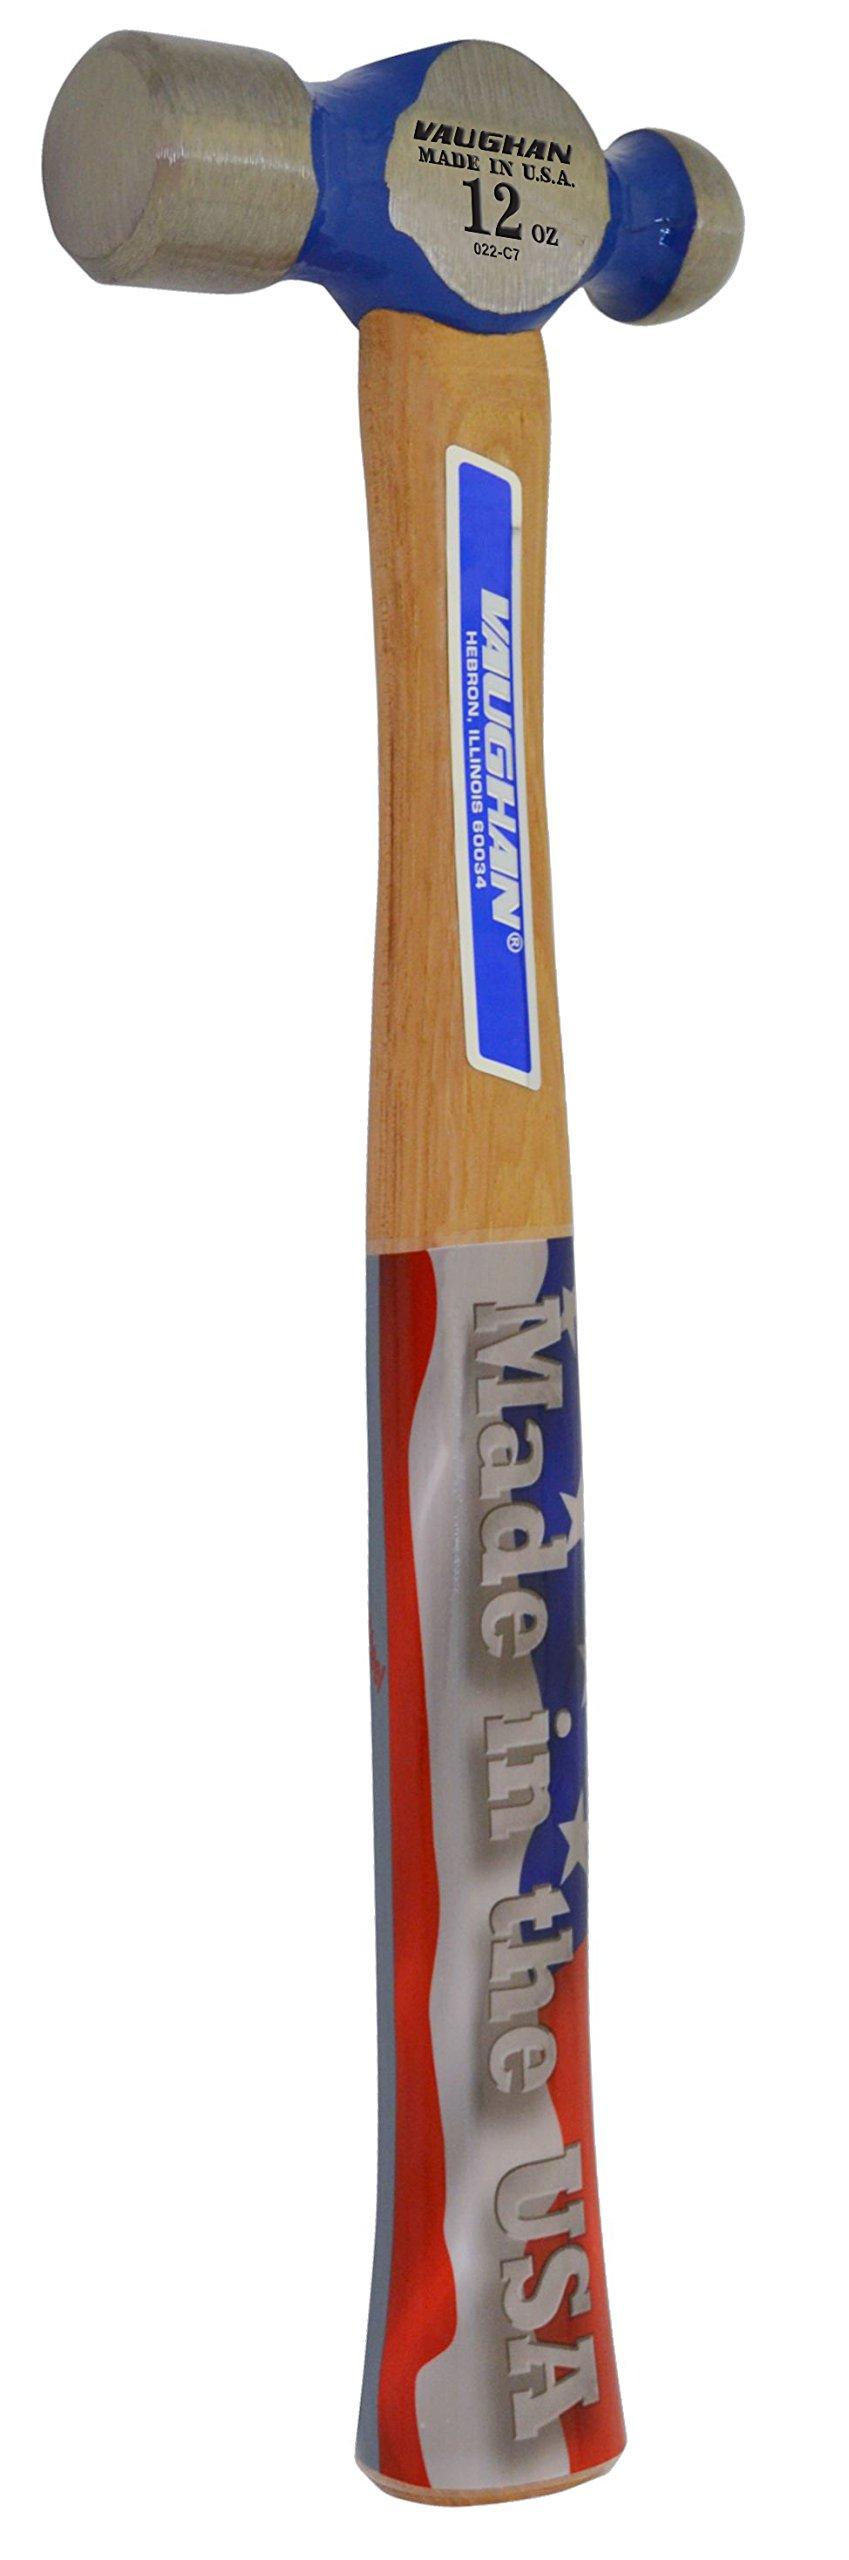 Vaughan TC2012 12-Ounce Commercial Ball Pein Hammer